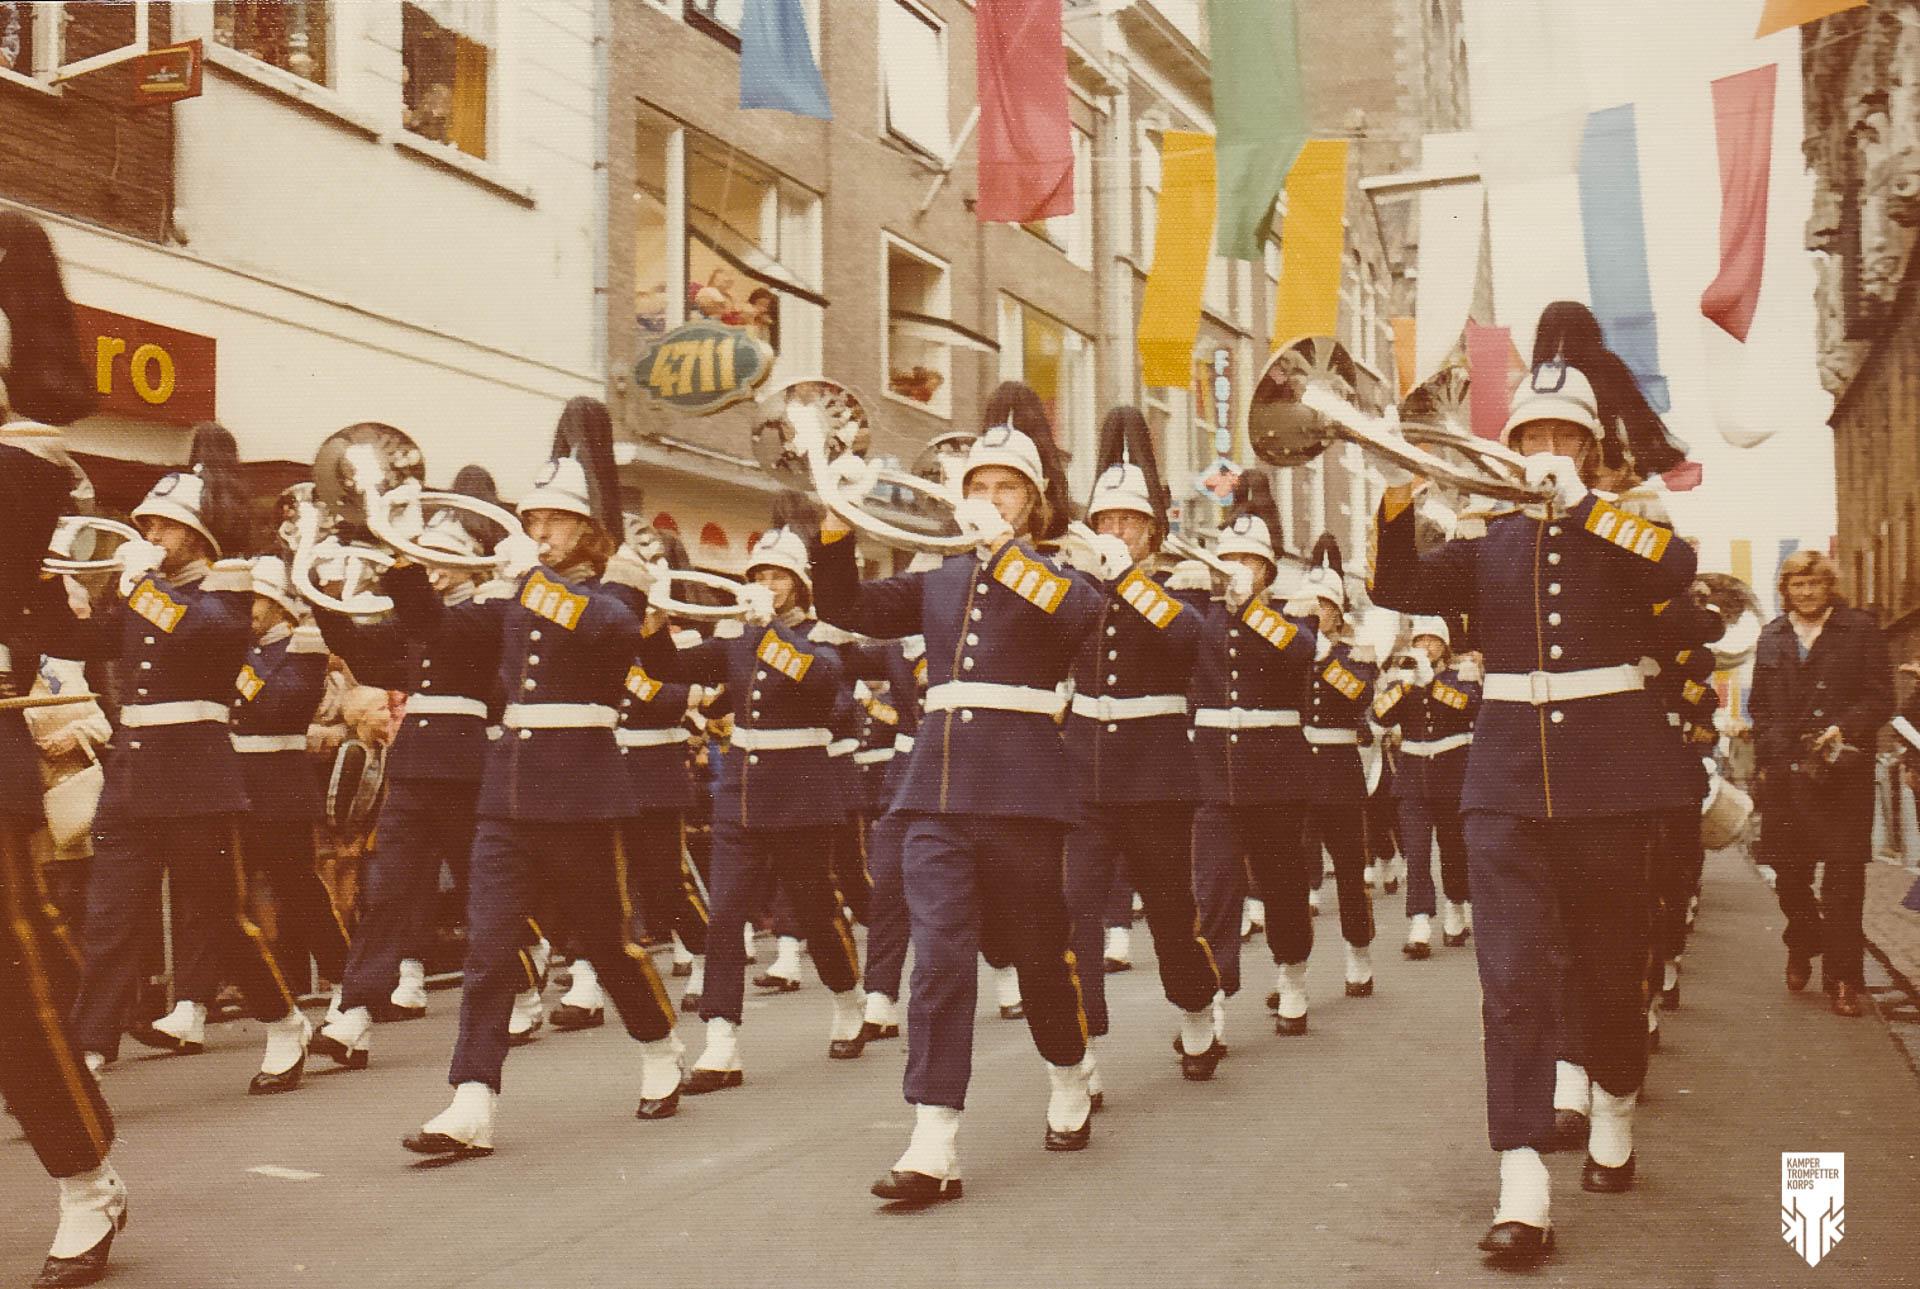 Jeugd Verkeers Brigade | KTK | Kampen | archief | historie | oude foto's | Jachthoornkorps | 1976